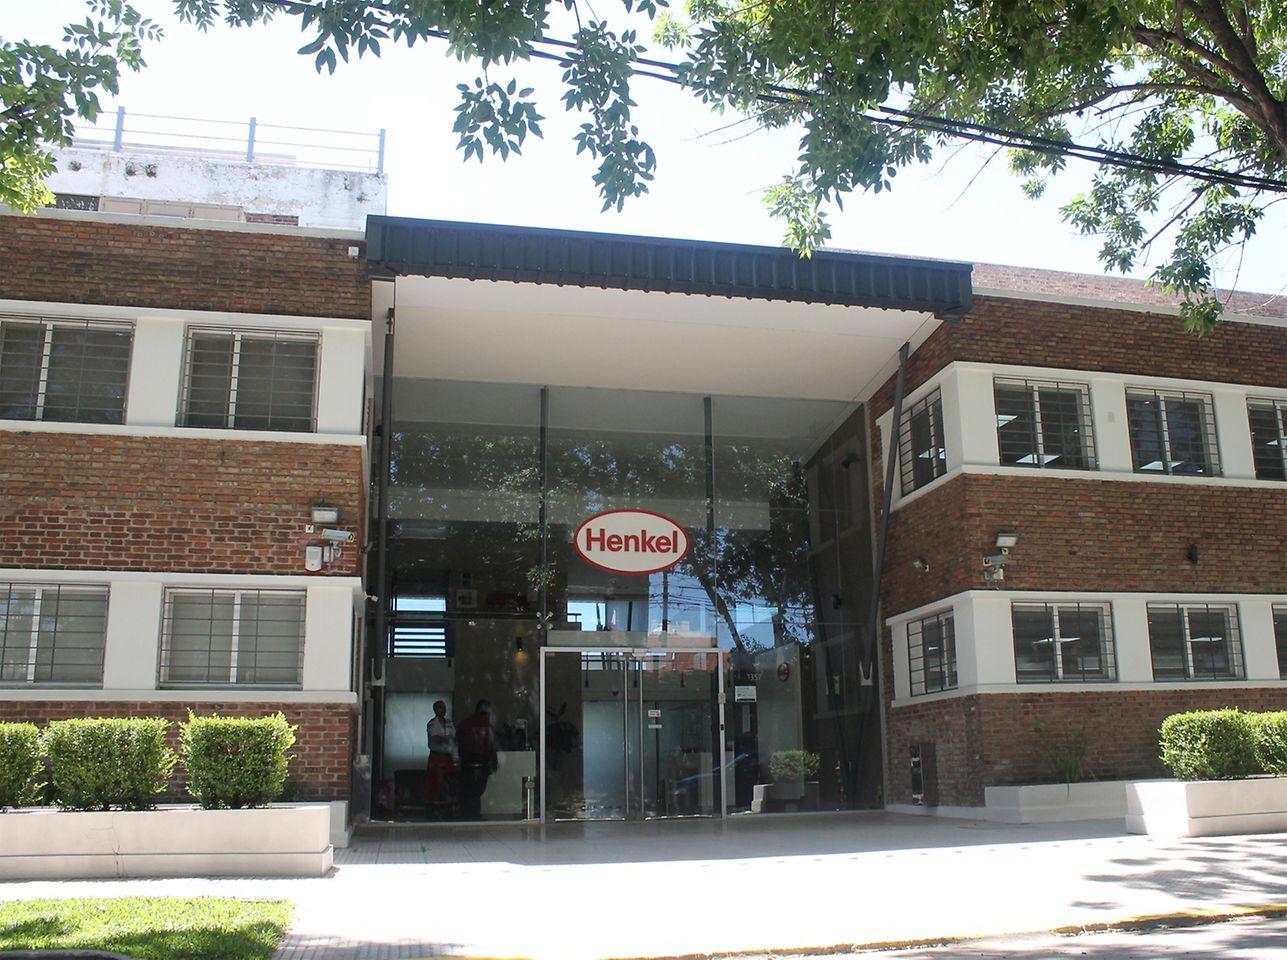 Edificio Henkel Argentina.